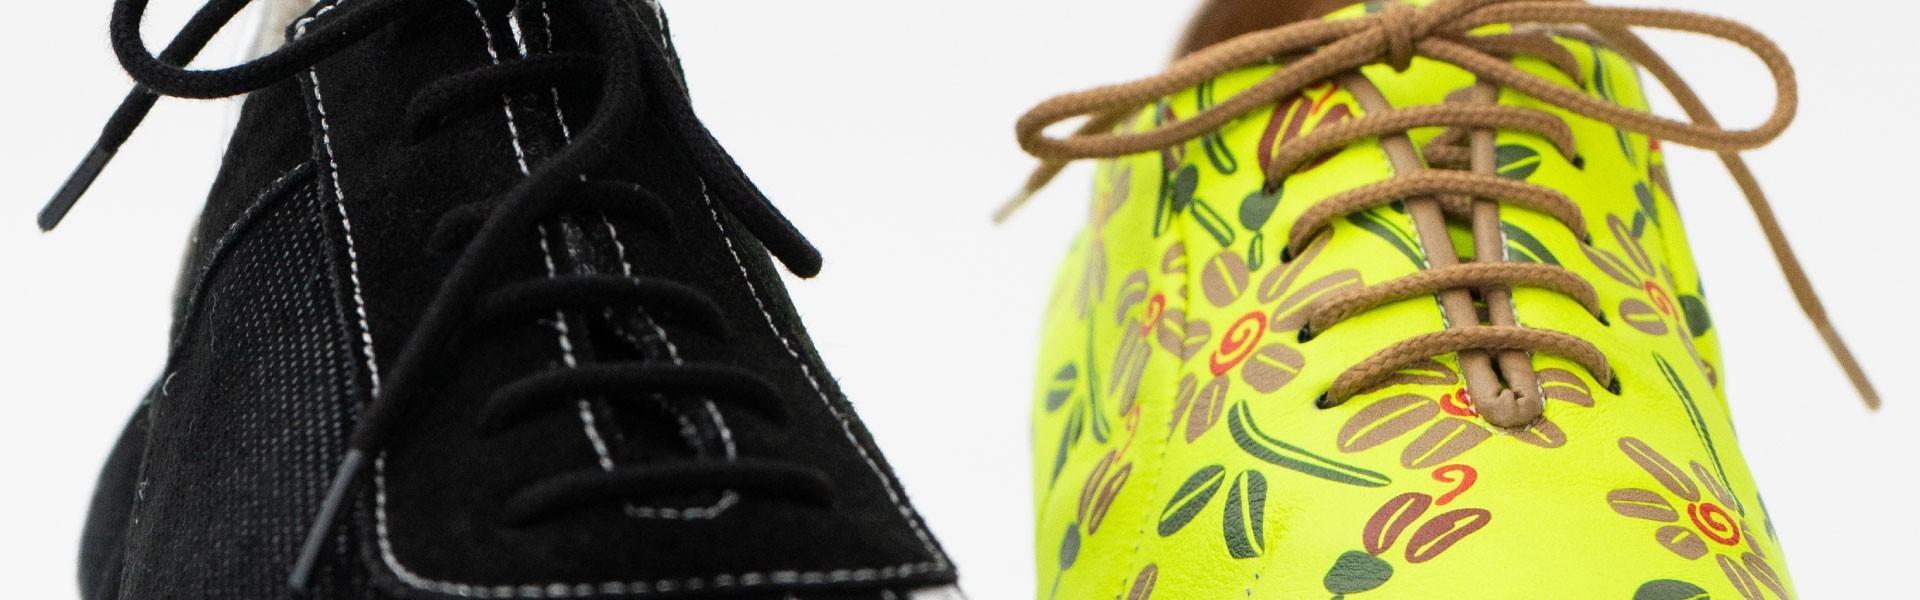 Training - 2HB Dance Shoes